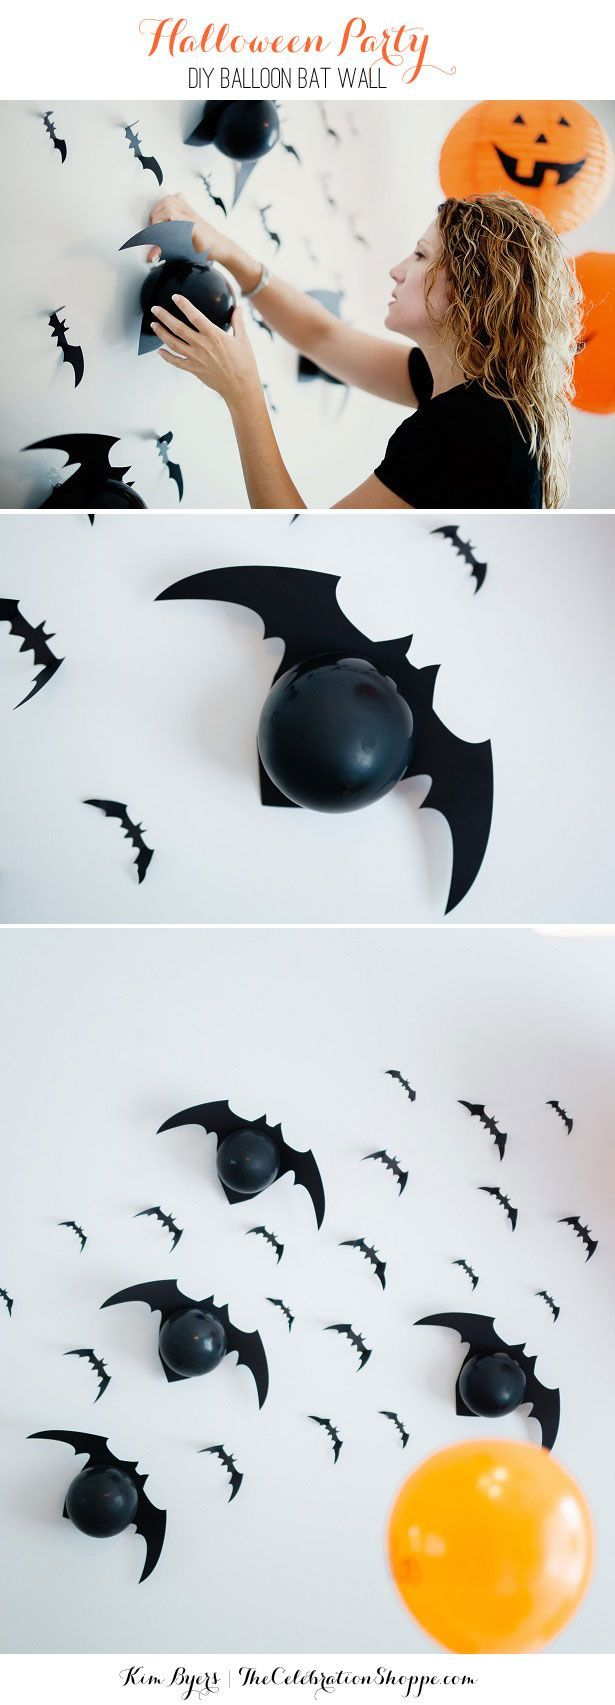 Batty Balloons